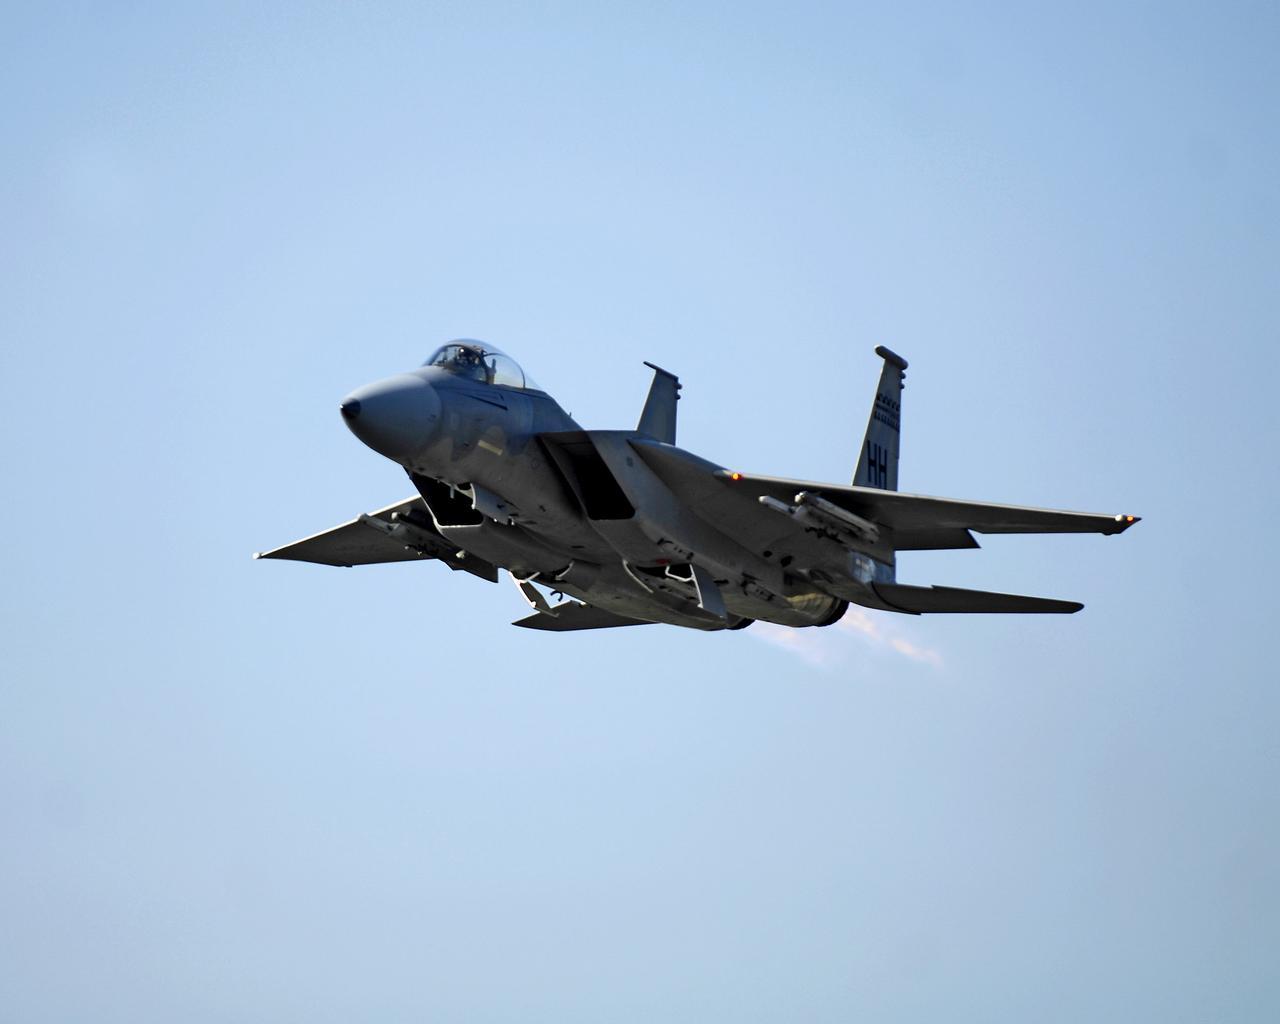 F 15 Strike Eagle F 15 Eagle Fighter Pic...